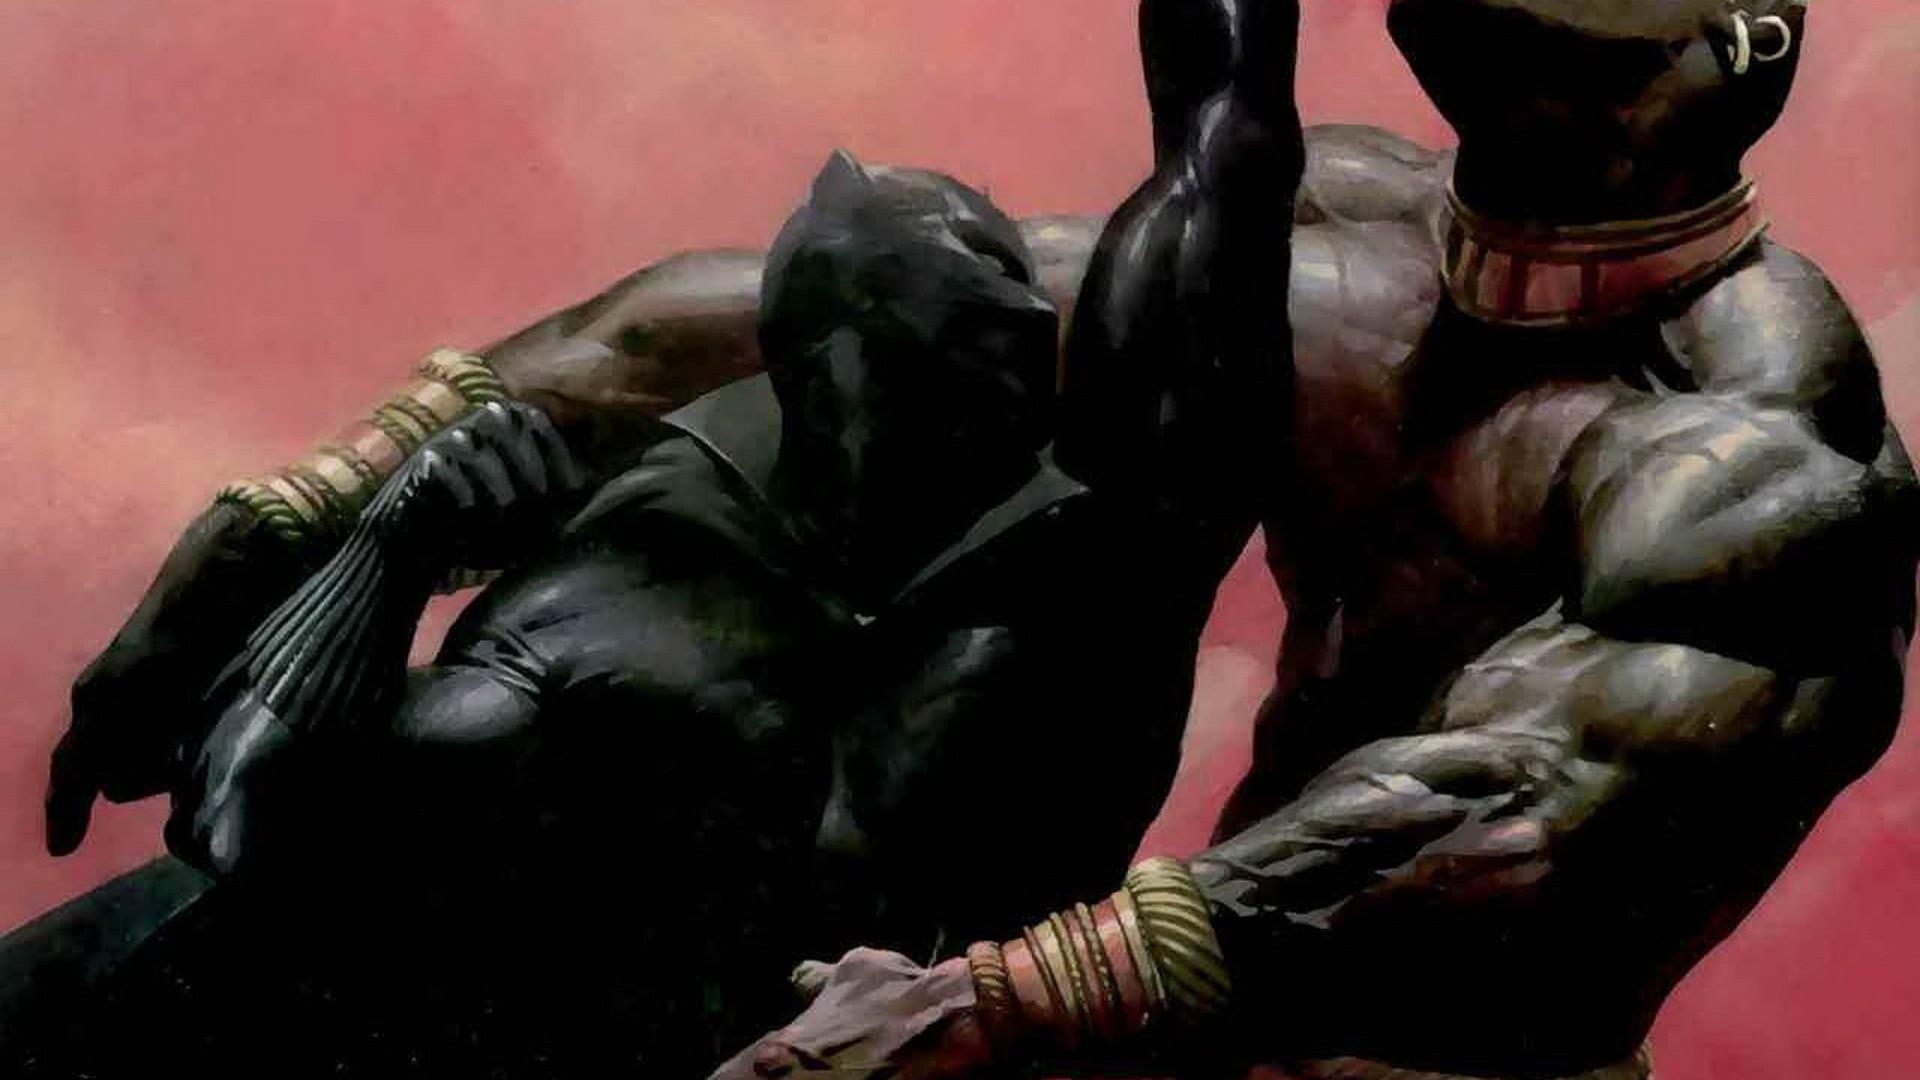 Black Panther Marvel 1920x1080 Wallpaper 1920x1080